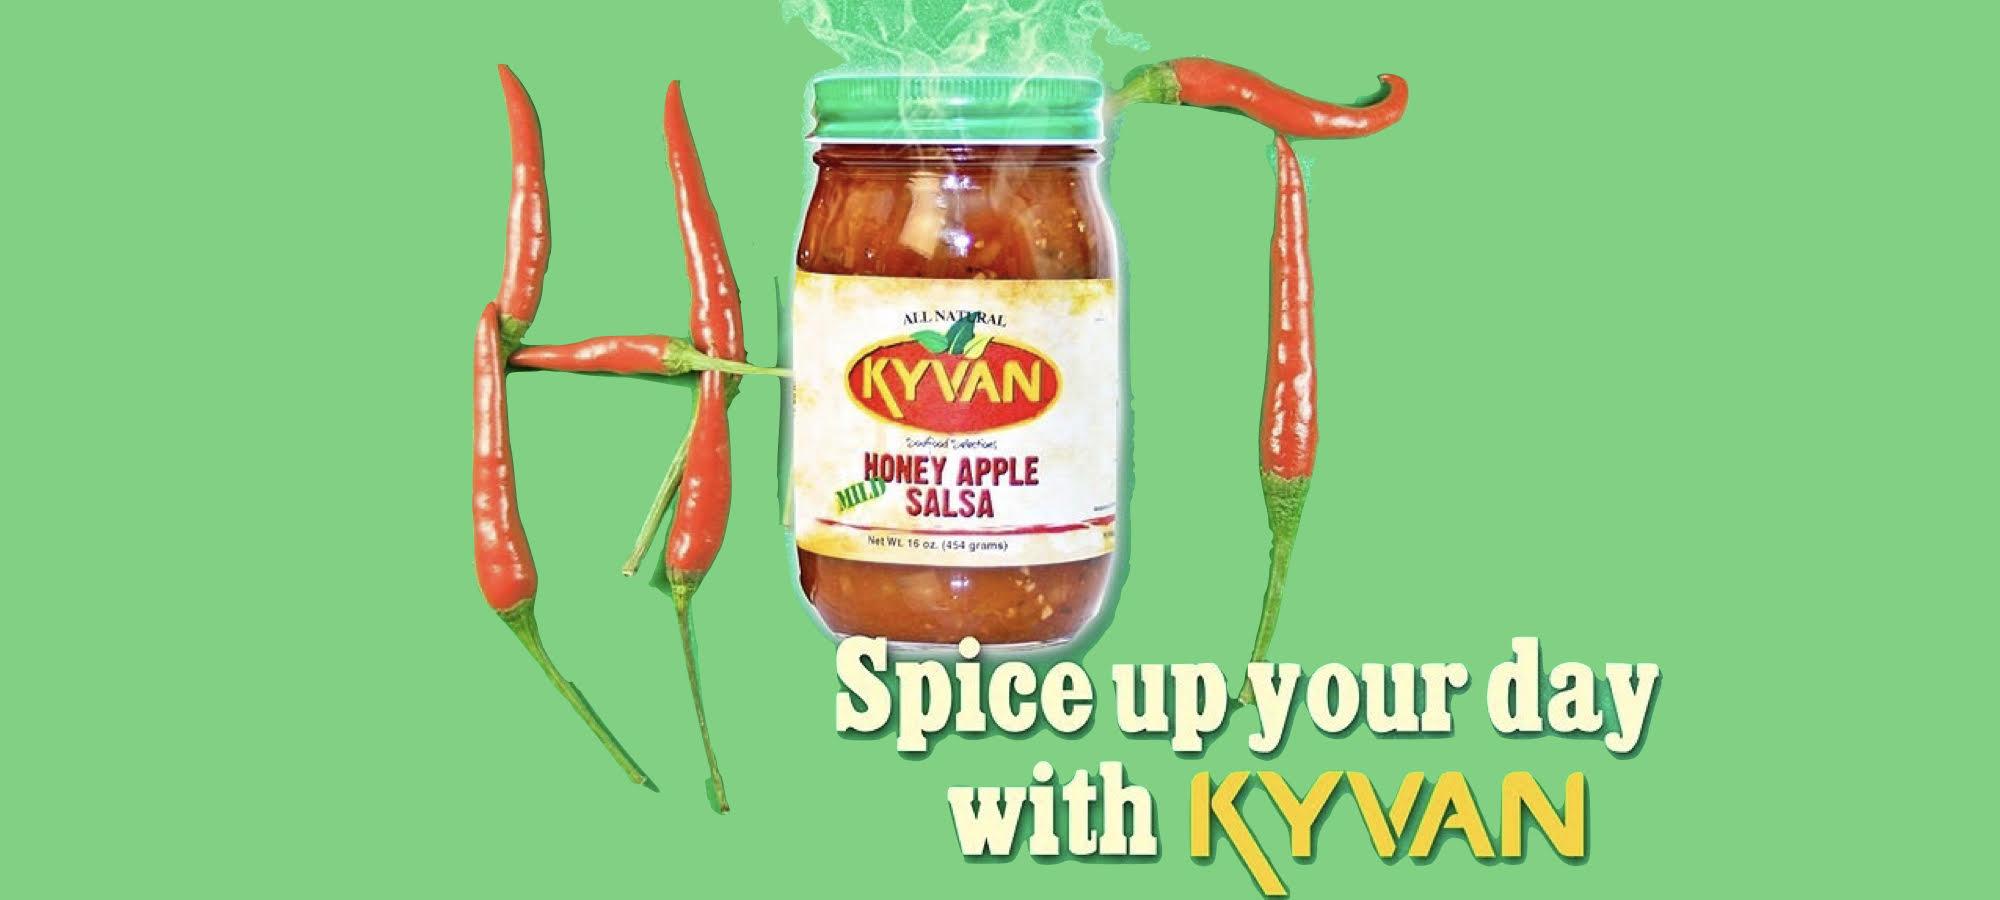 Kyvan    Shop now